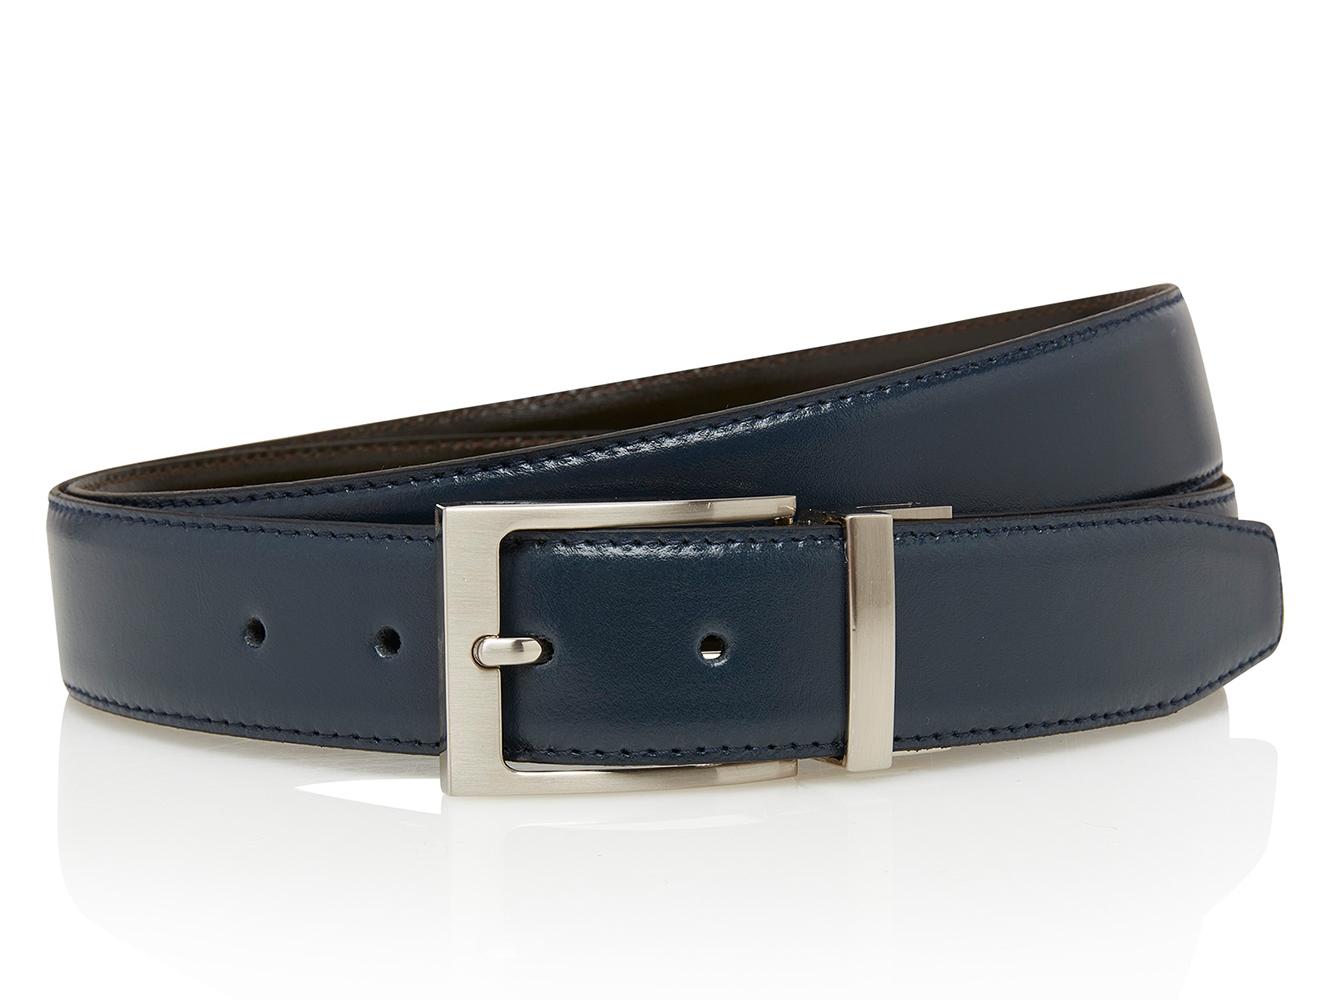 Timbelt Df Heren Volnerf Leren Pantalon Riem 105/3,5 cm Blauw/Bruin